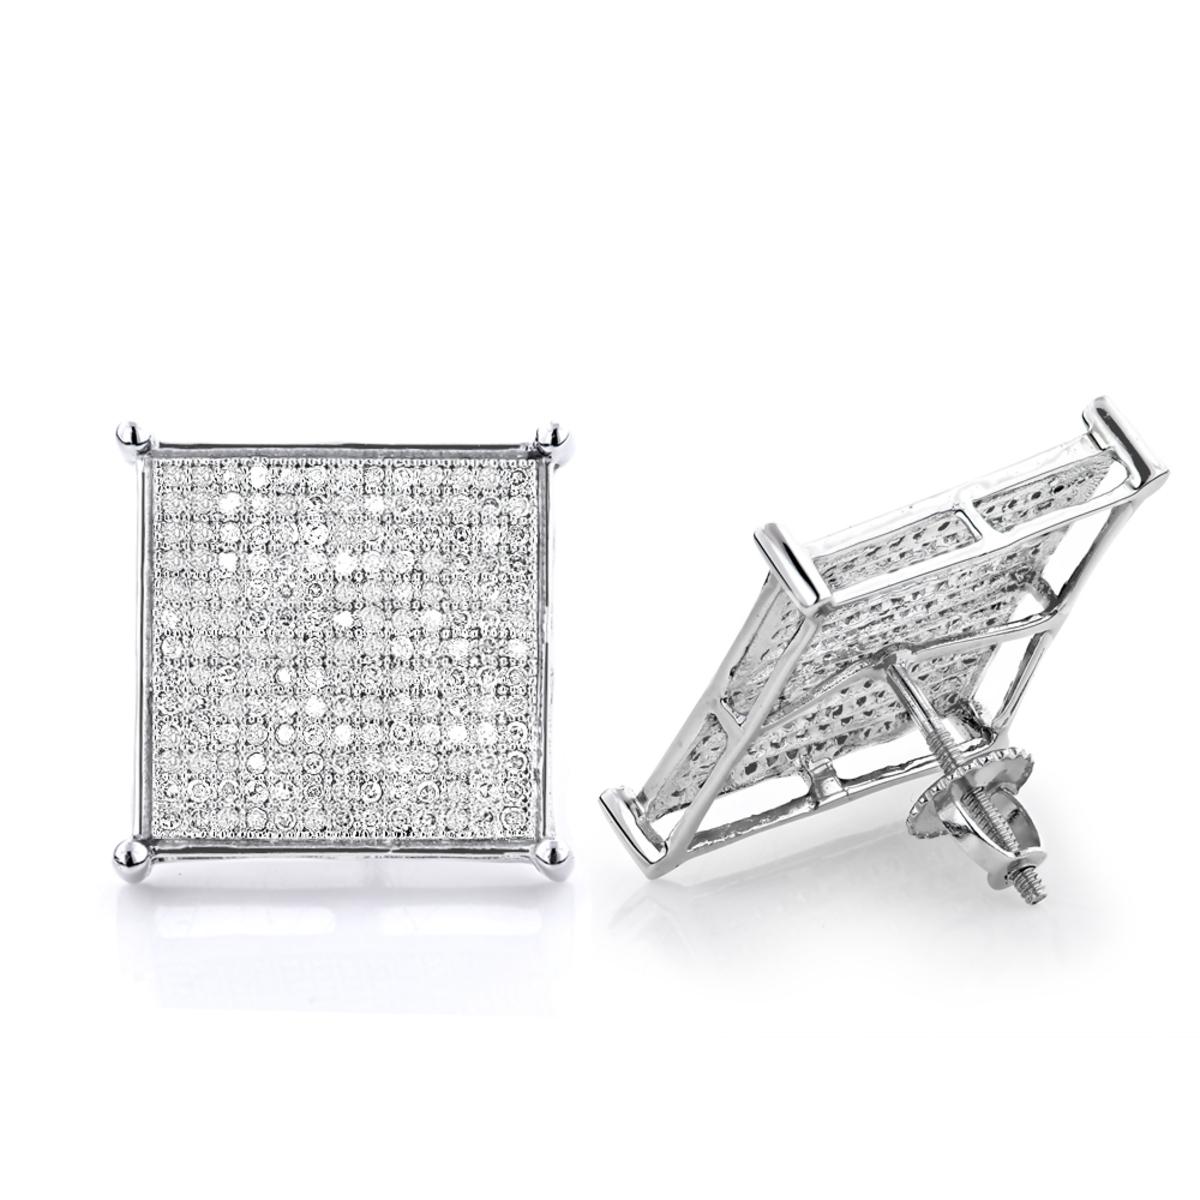 Real Hip Hop Jewelry: Diamond Earrings 10K Gold 1.13ct